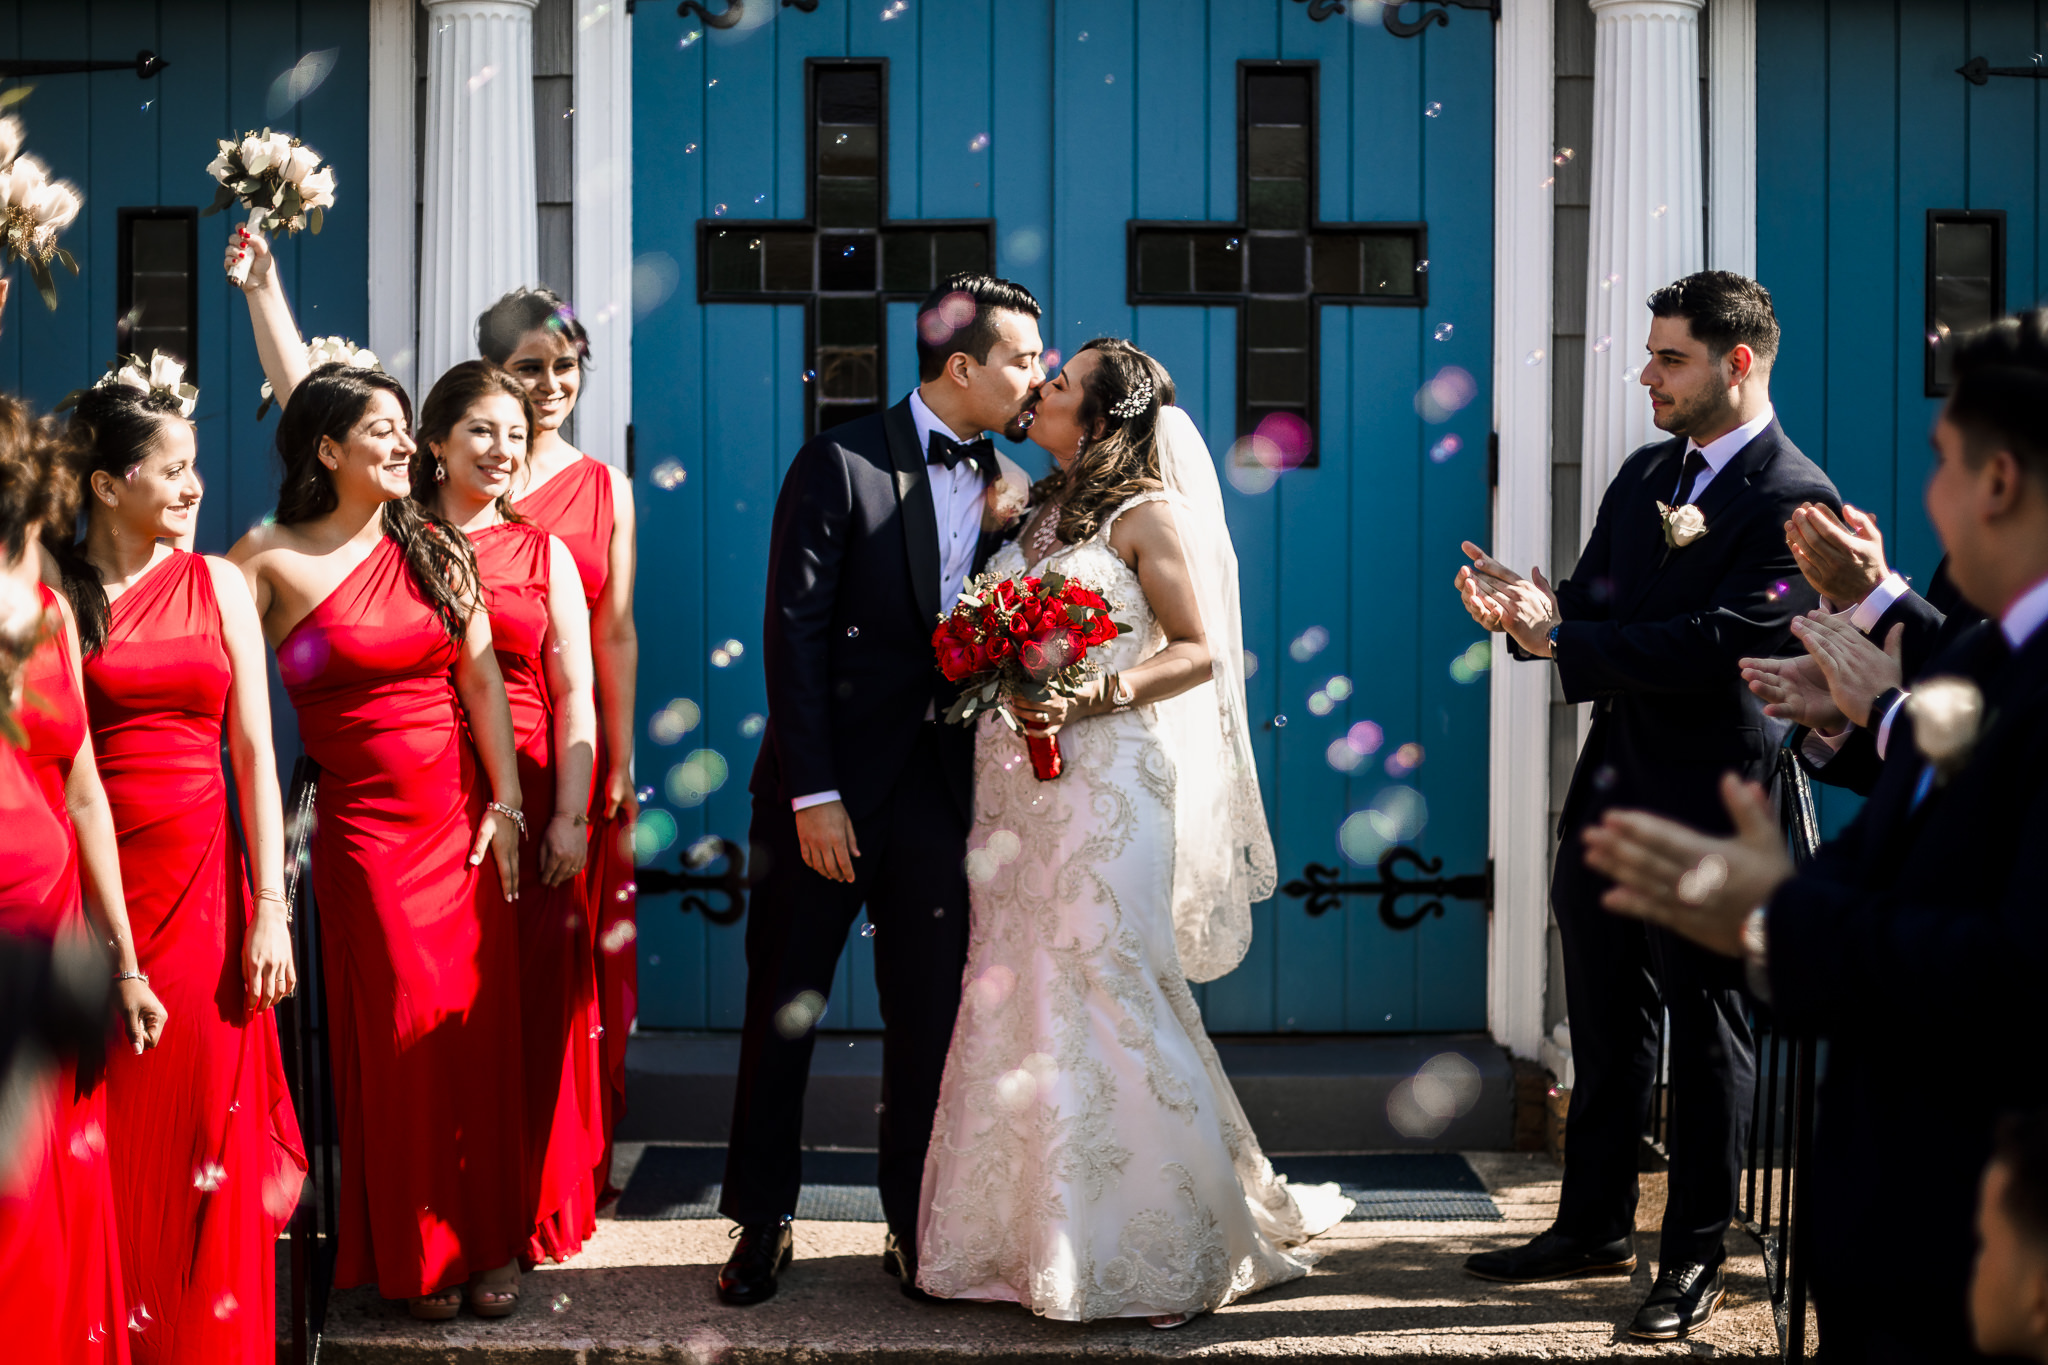 Sanchez-Leonards-Palazzo-New-York-Wedding-Photographer-24.JPG